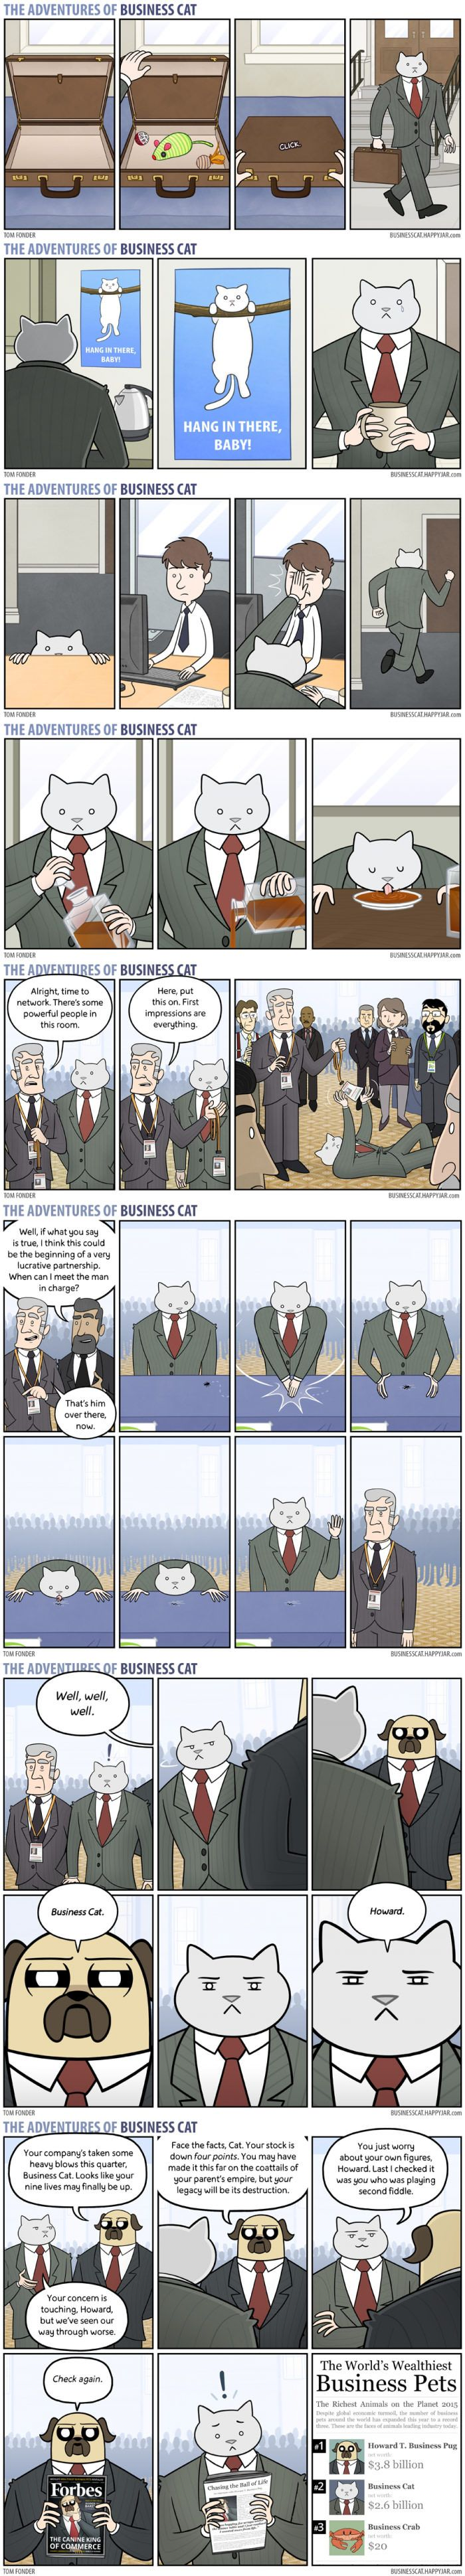 Business Cat Part 4 - 9GAG